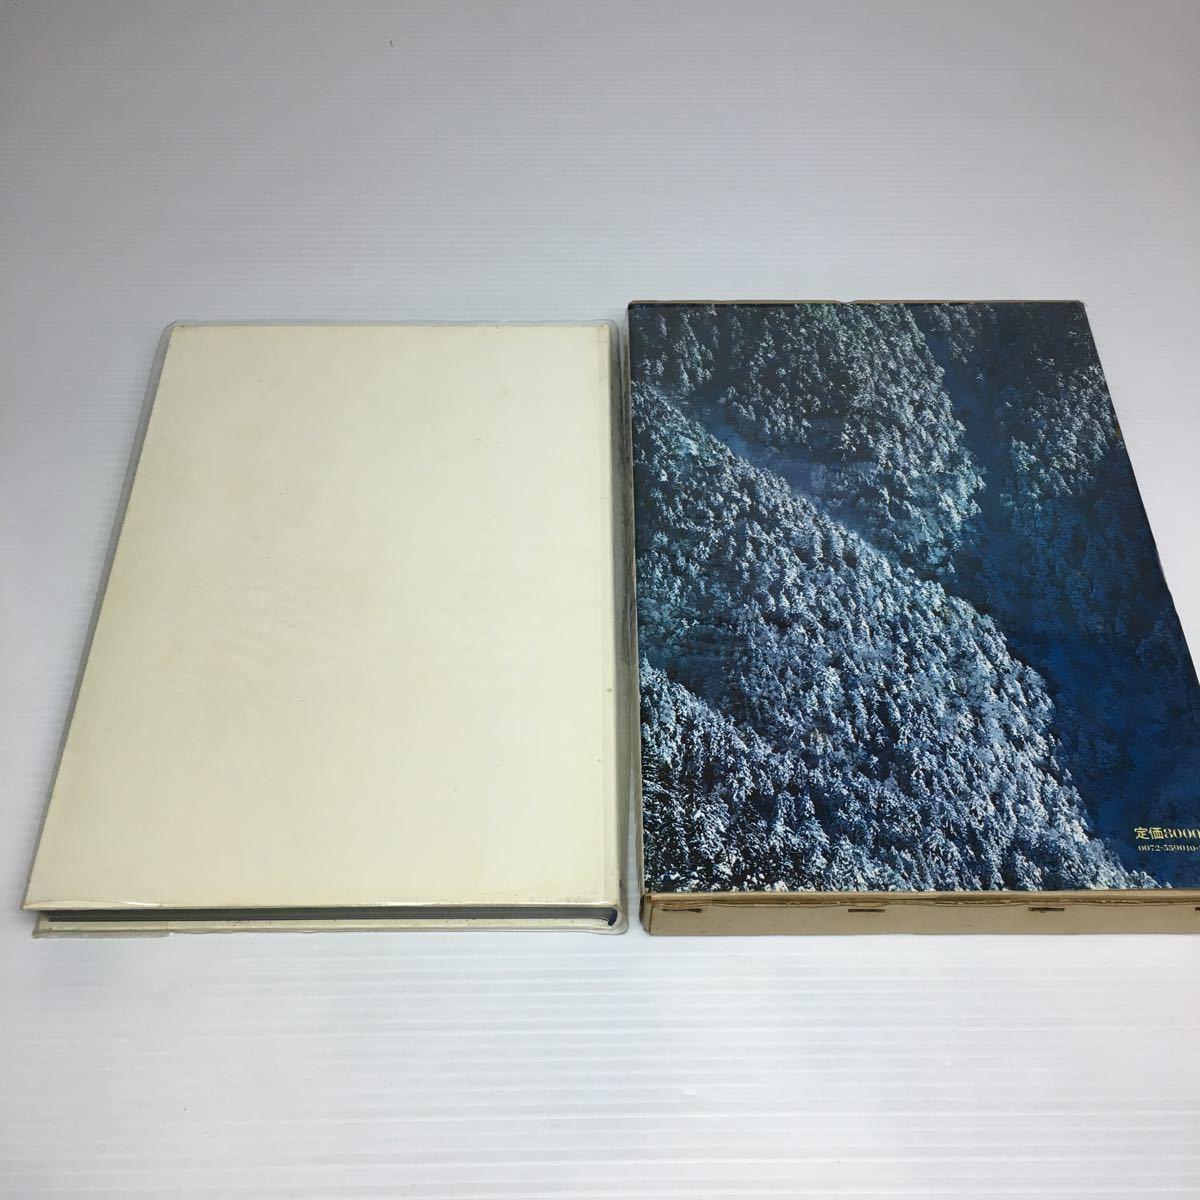 x2/北アルプス 日本山岳写真集団 昭和54年初版 定価8000円_画像4